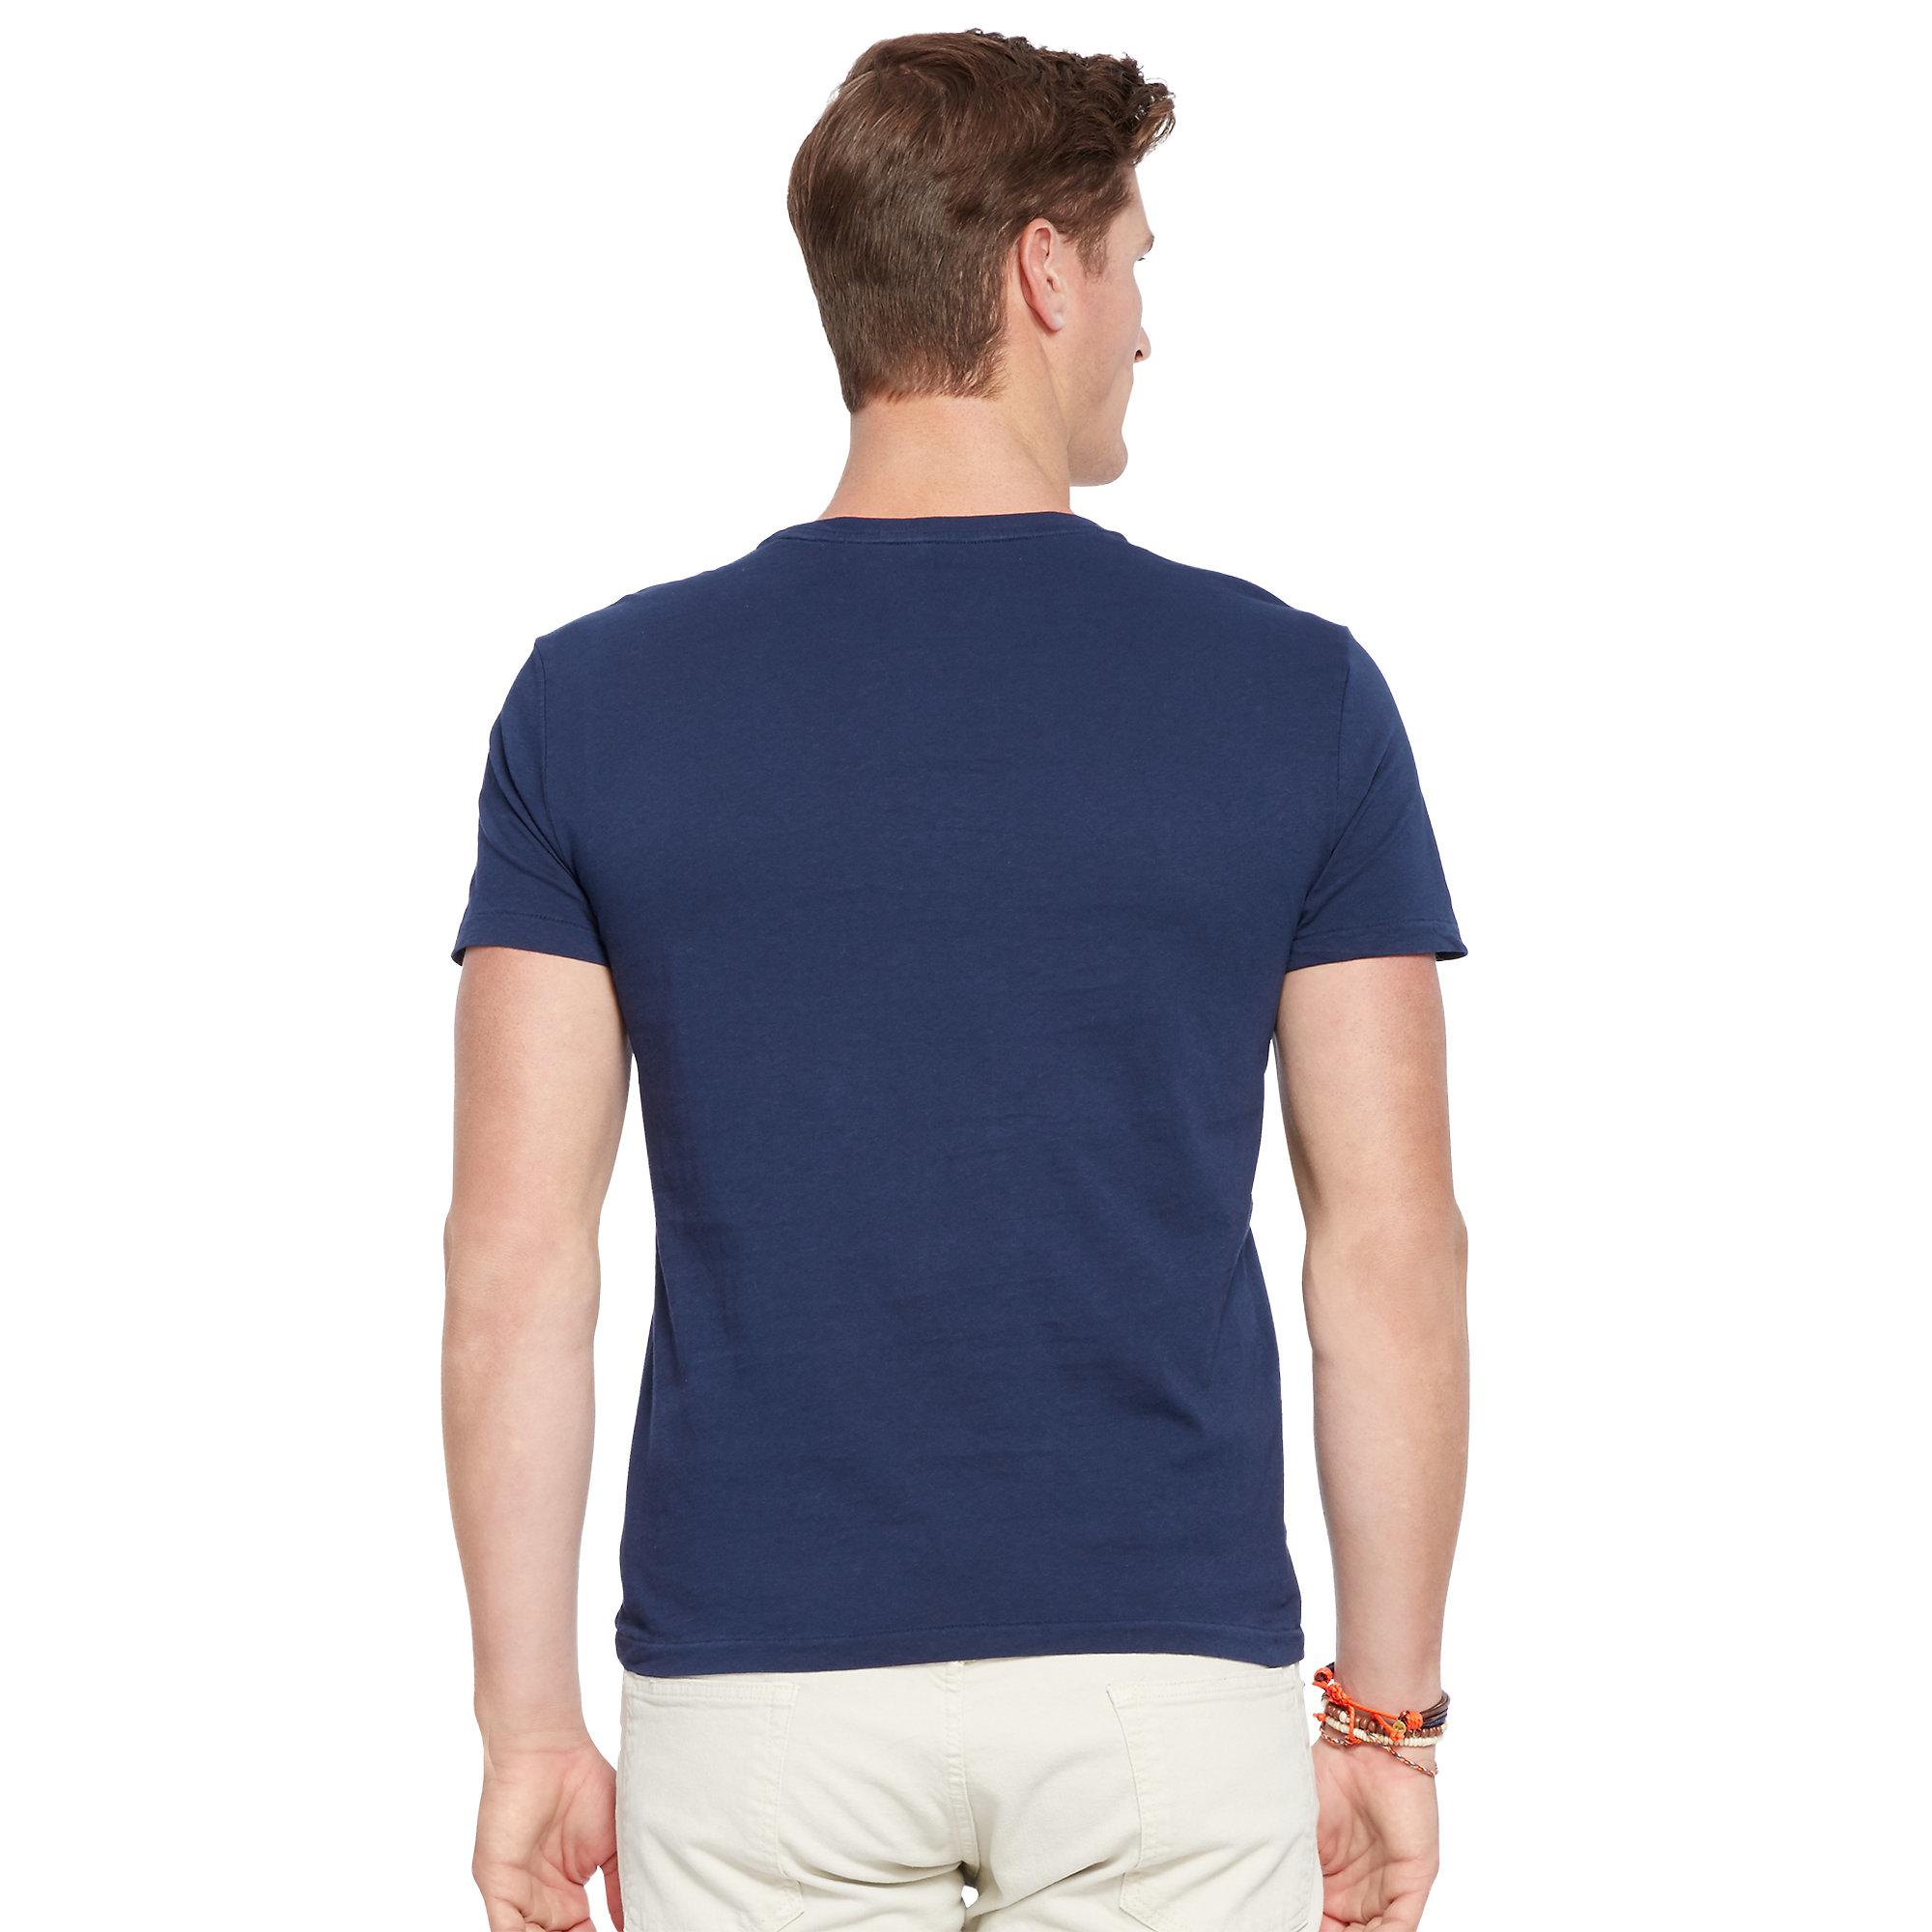 Polo ralph lauren custom fit graphic t shirt in blue for for Polo custom fit t shirts